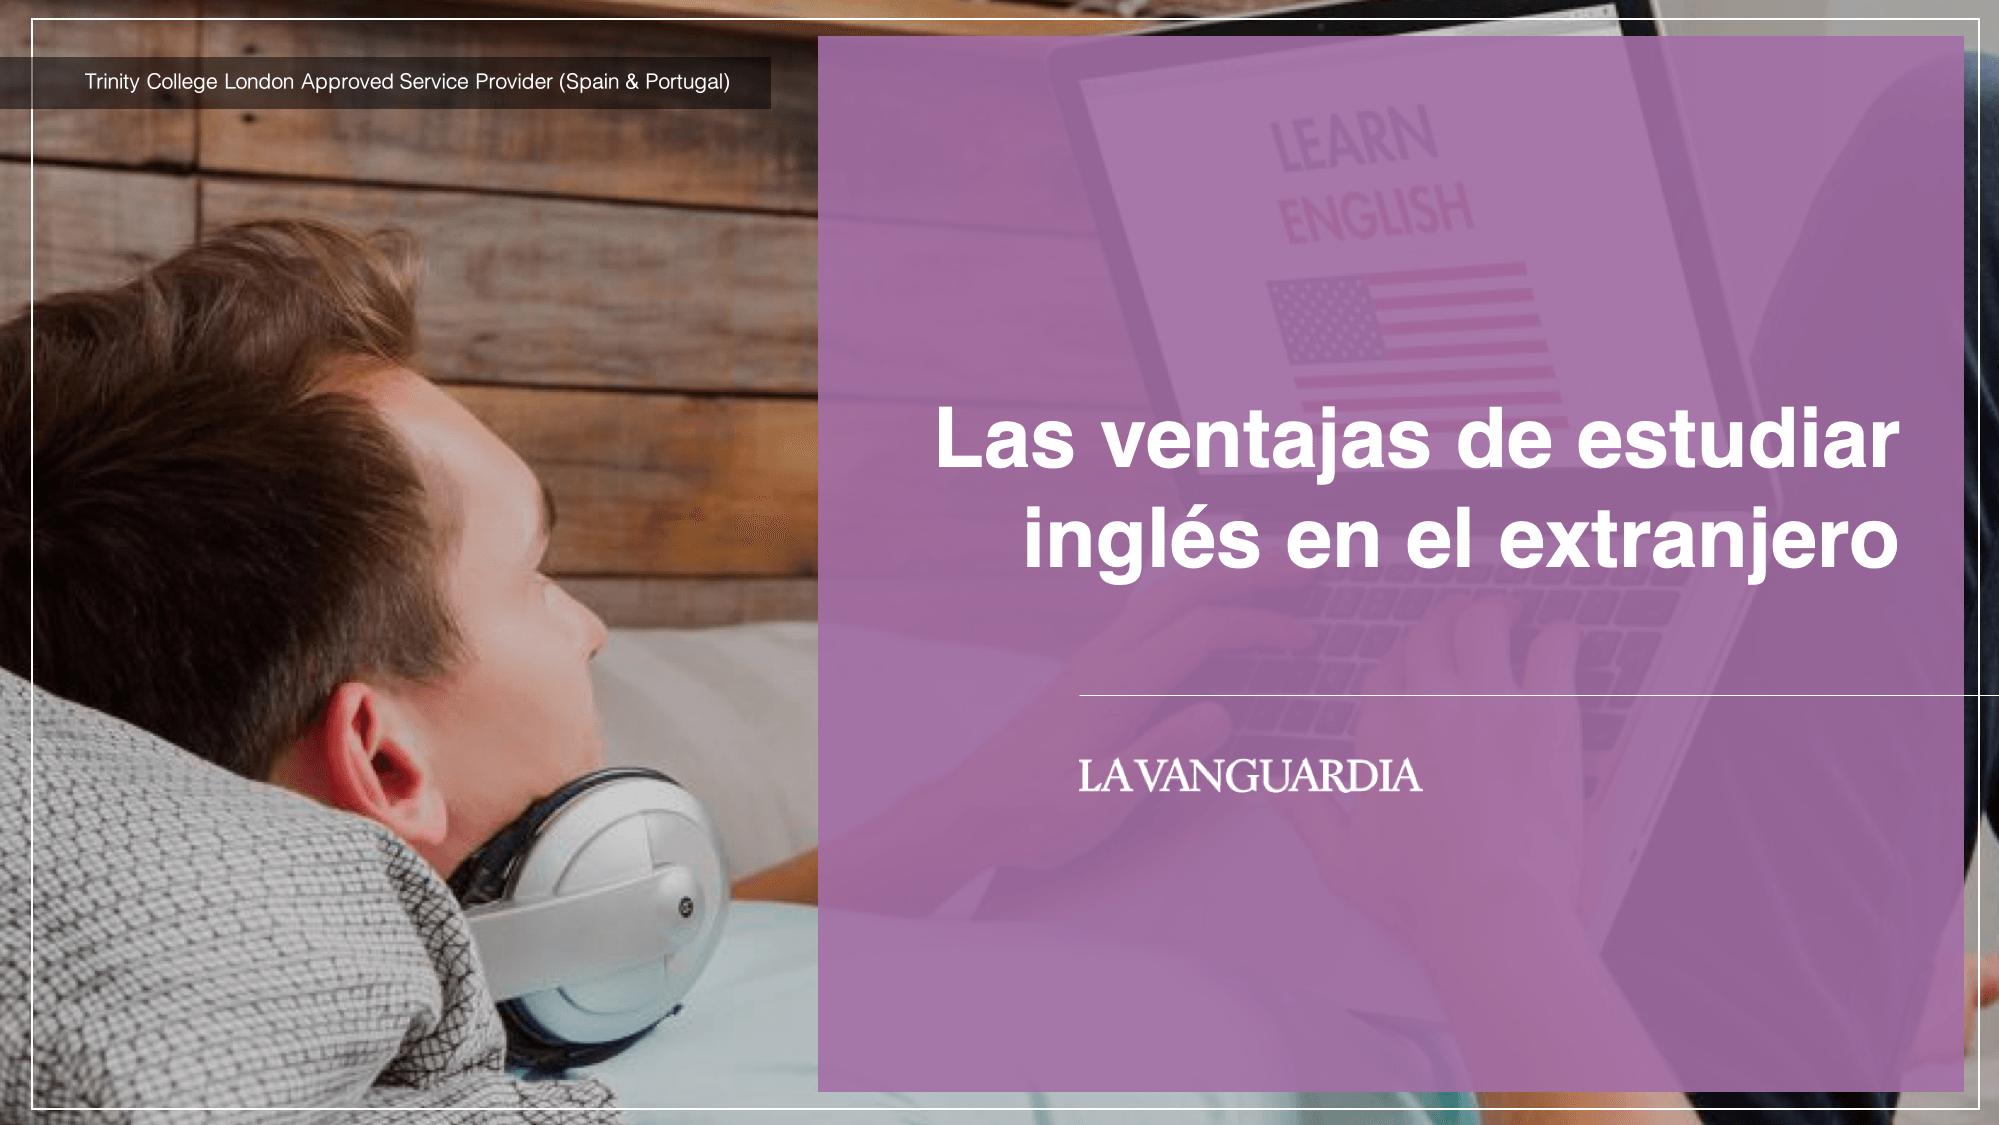 Las ventajas de estudiar inglés en el extranjero - La Vanguardia